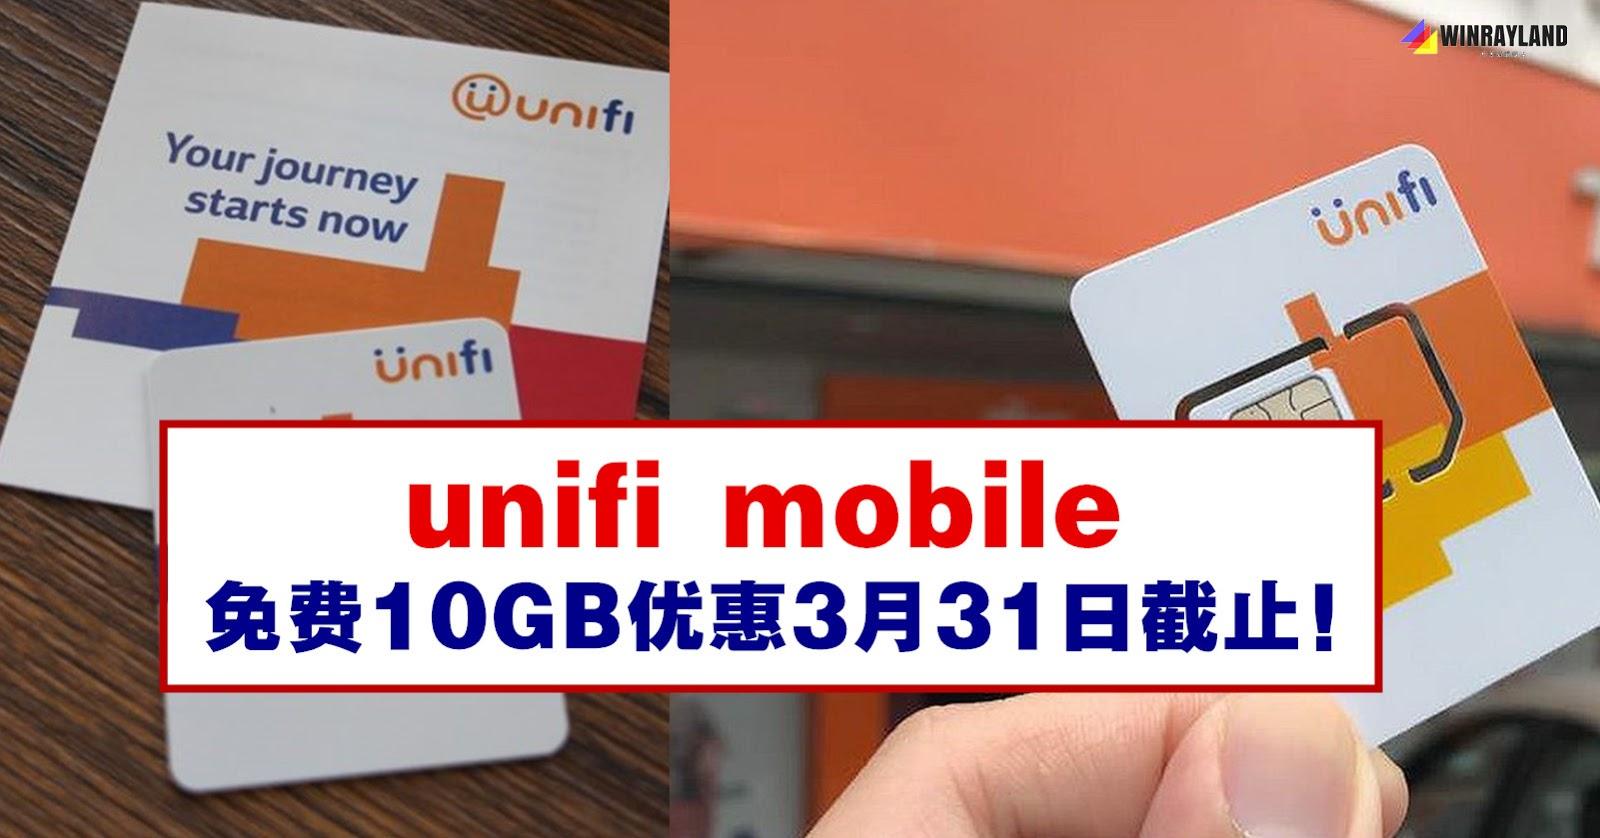 unifi mobile 优惠将在3月31日截止!